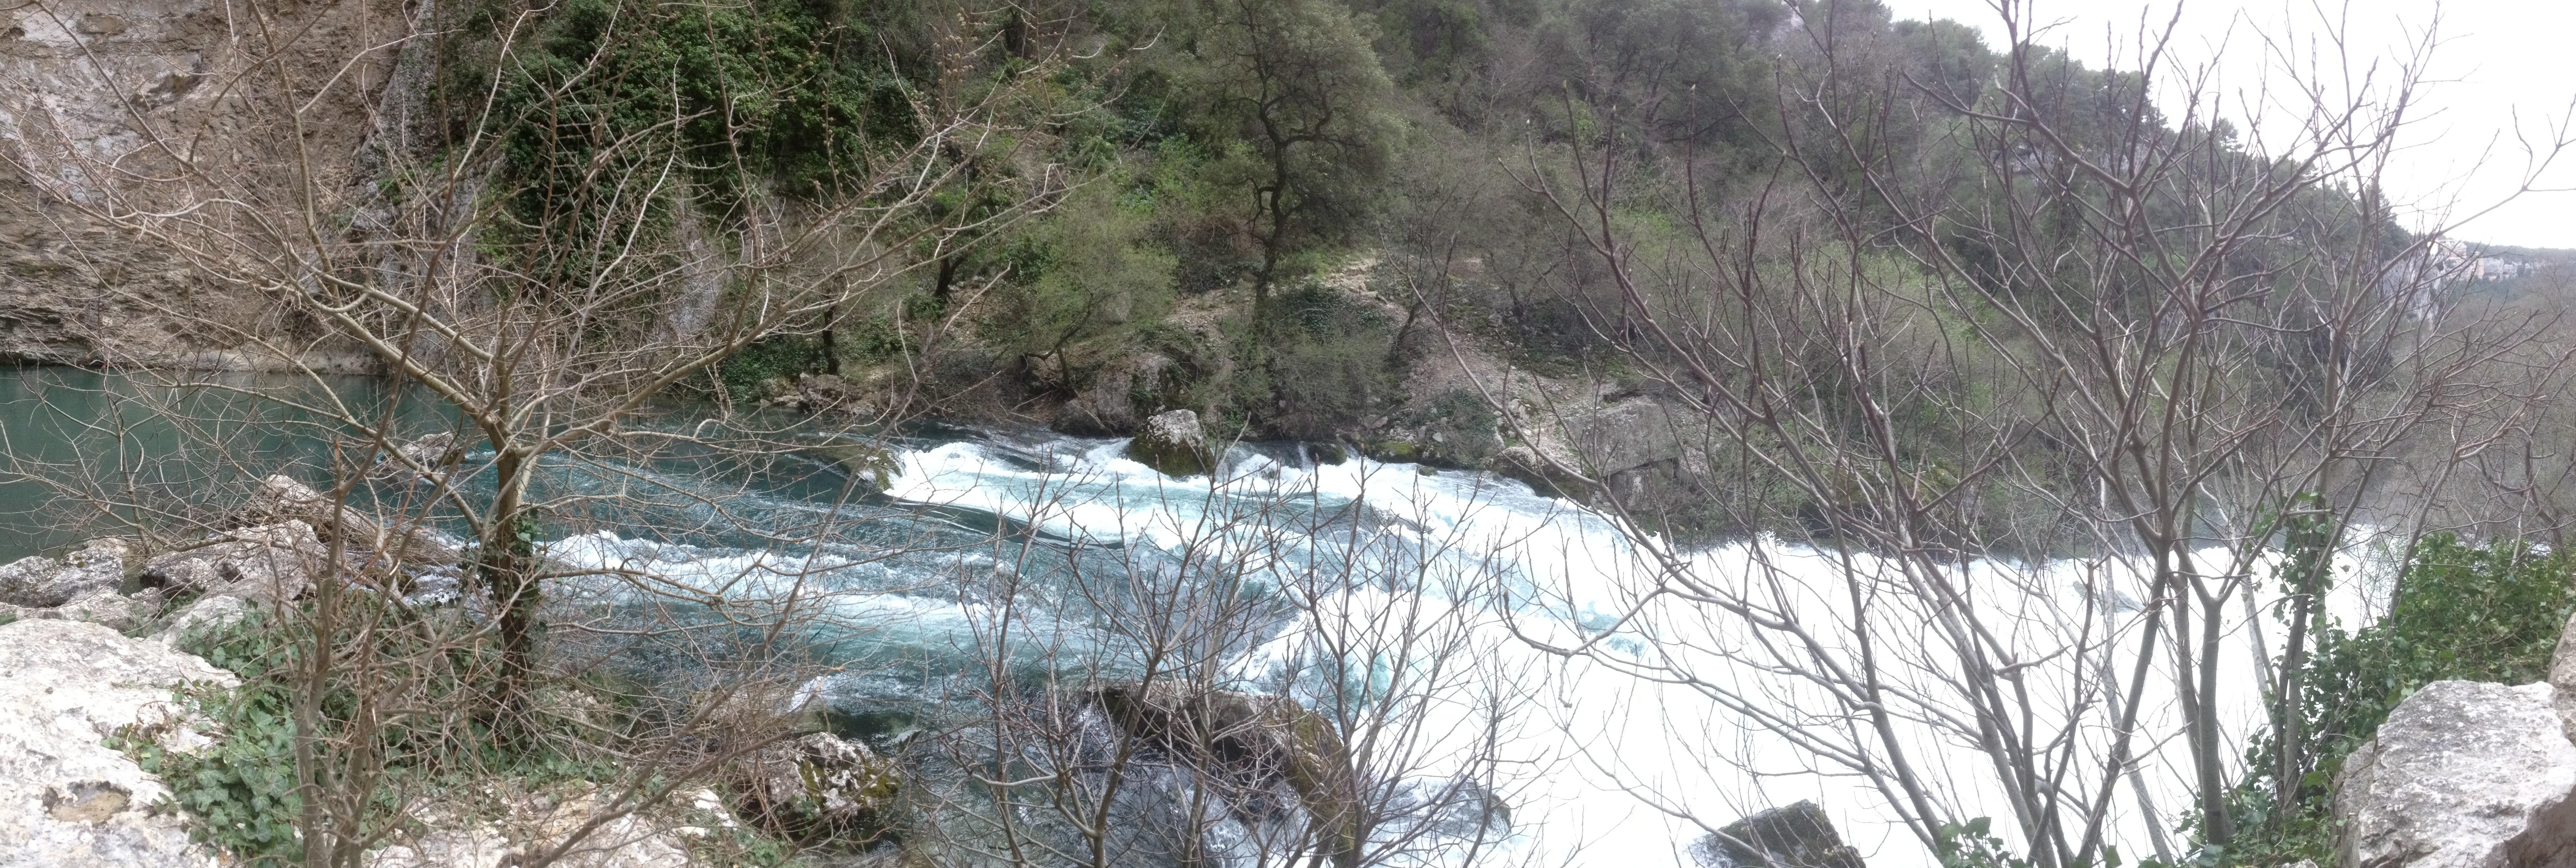 Fontaine de Vaucluse - ma Cigale - Crue mars 2013